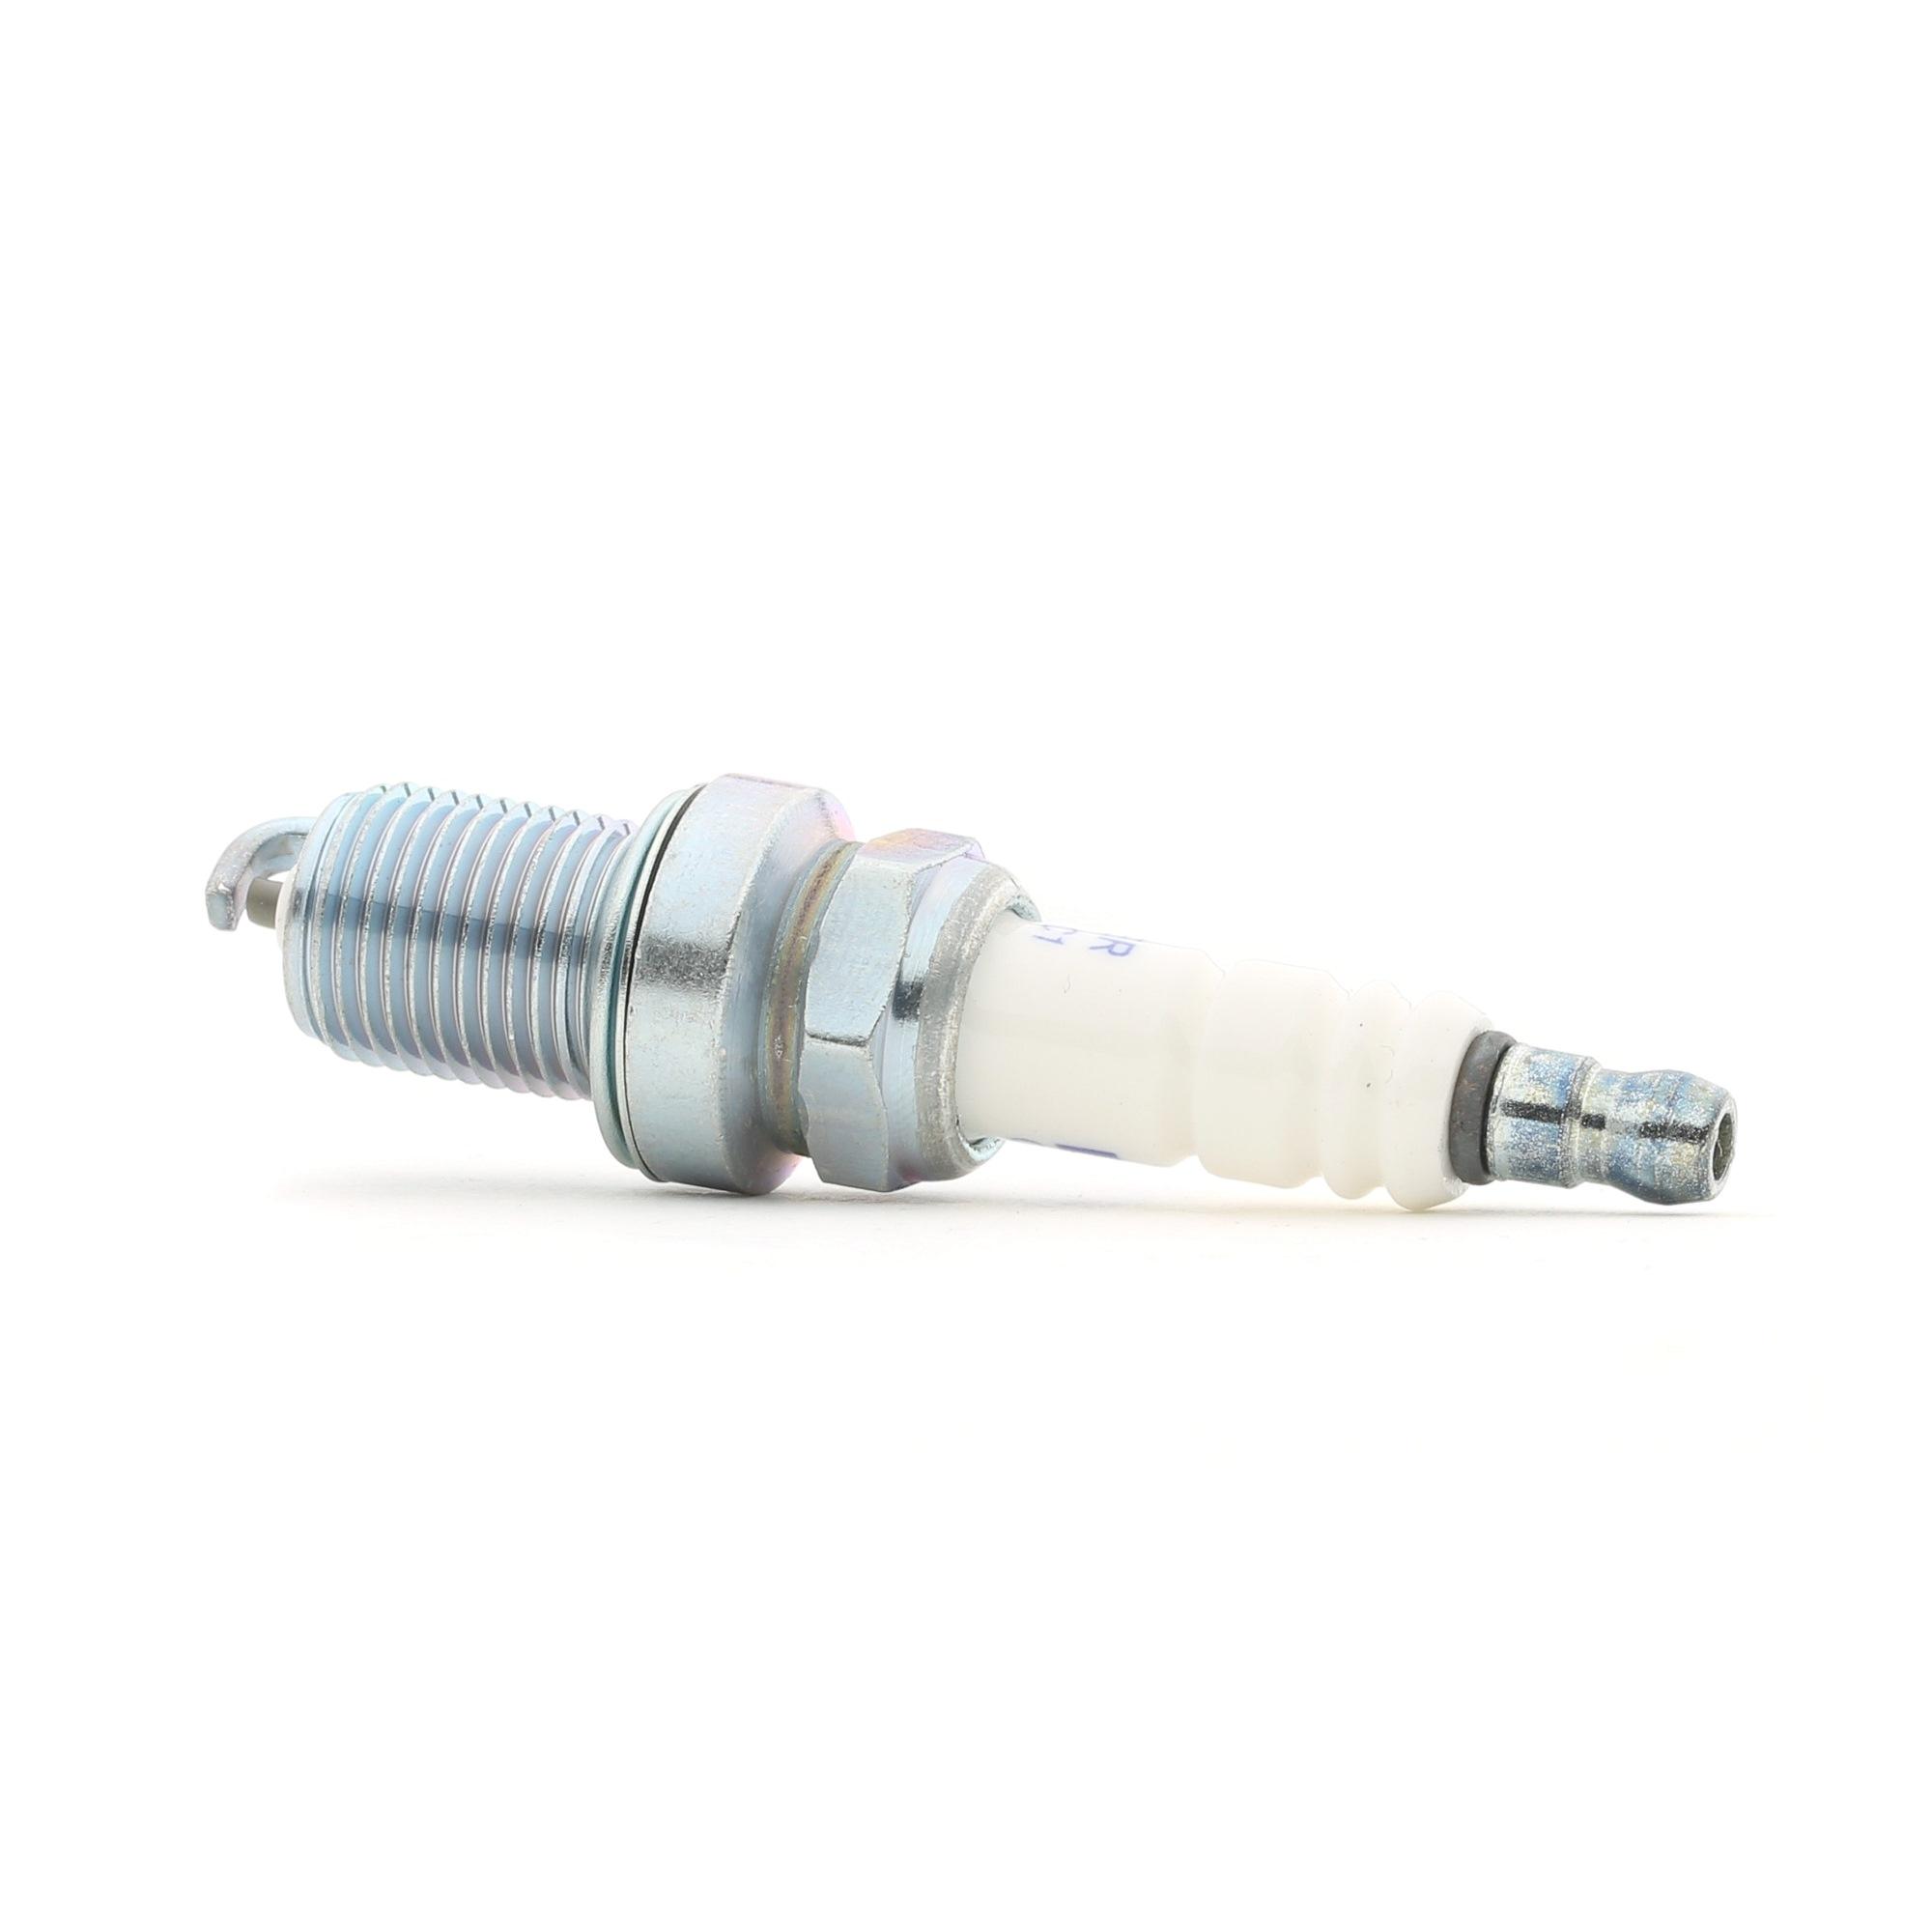 Spark Plug VEMO V99-75-0019 rating